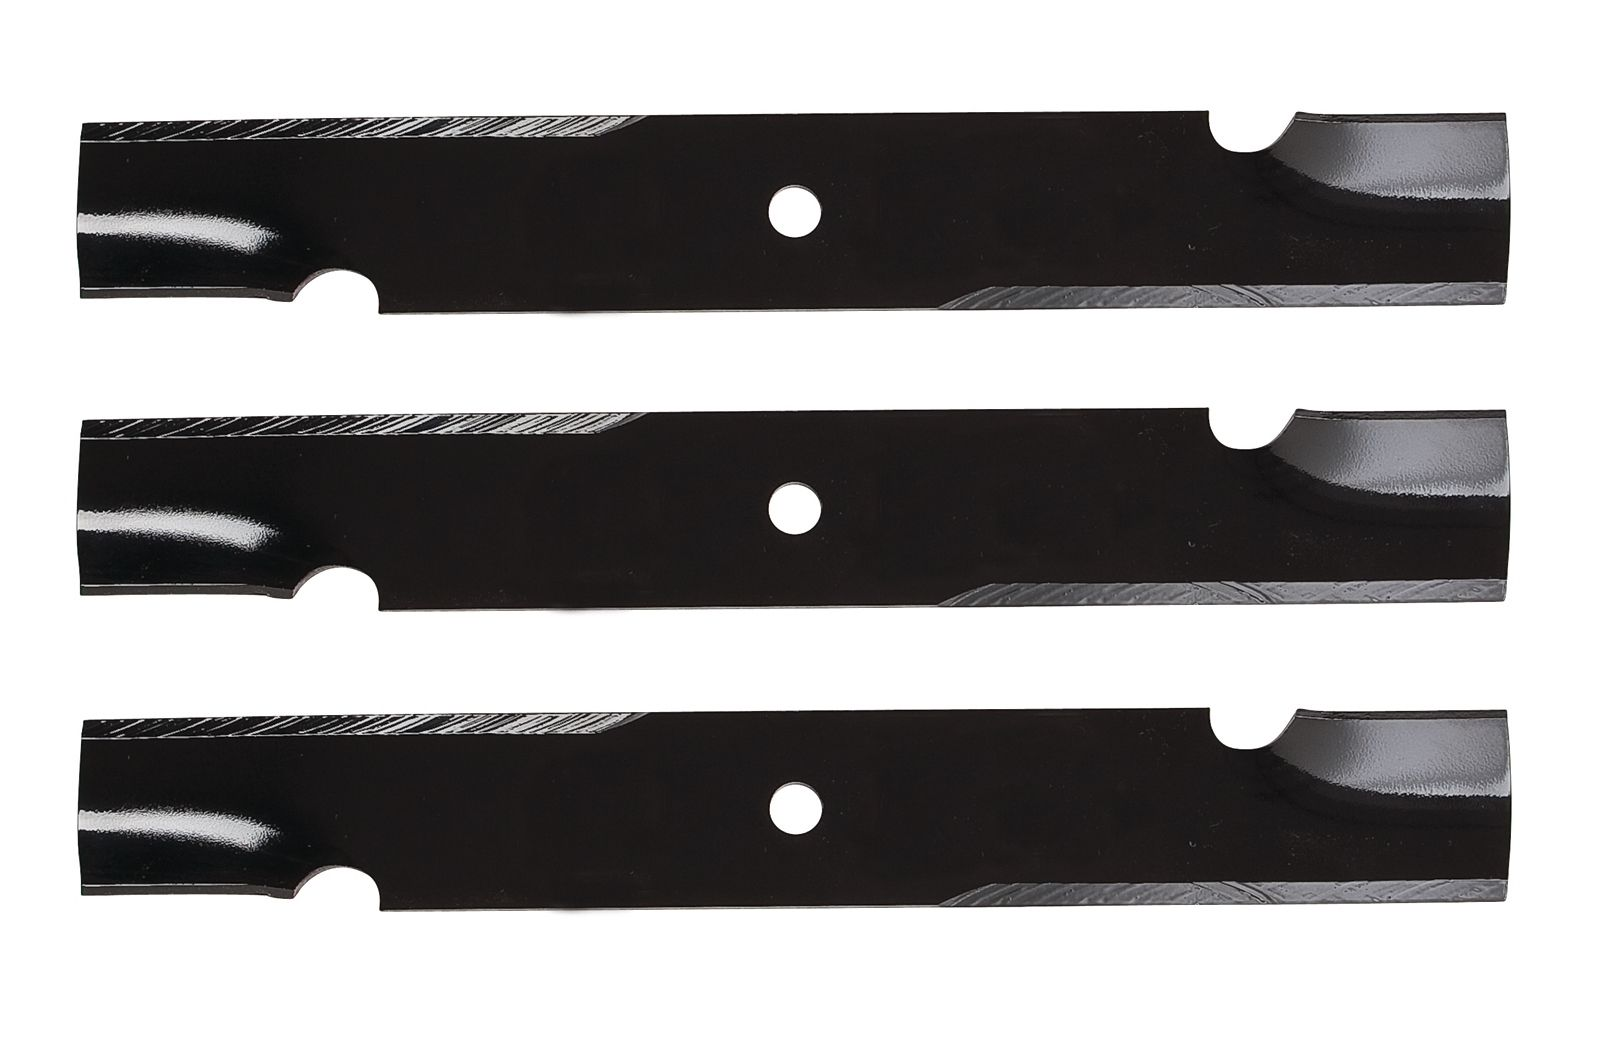 "3 Oregon 91-622 Blades for Ferris 52/"" Cut 21227S 481711 5021227 5101756S A48185"